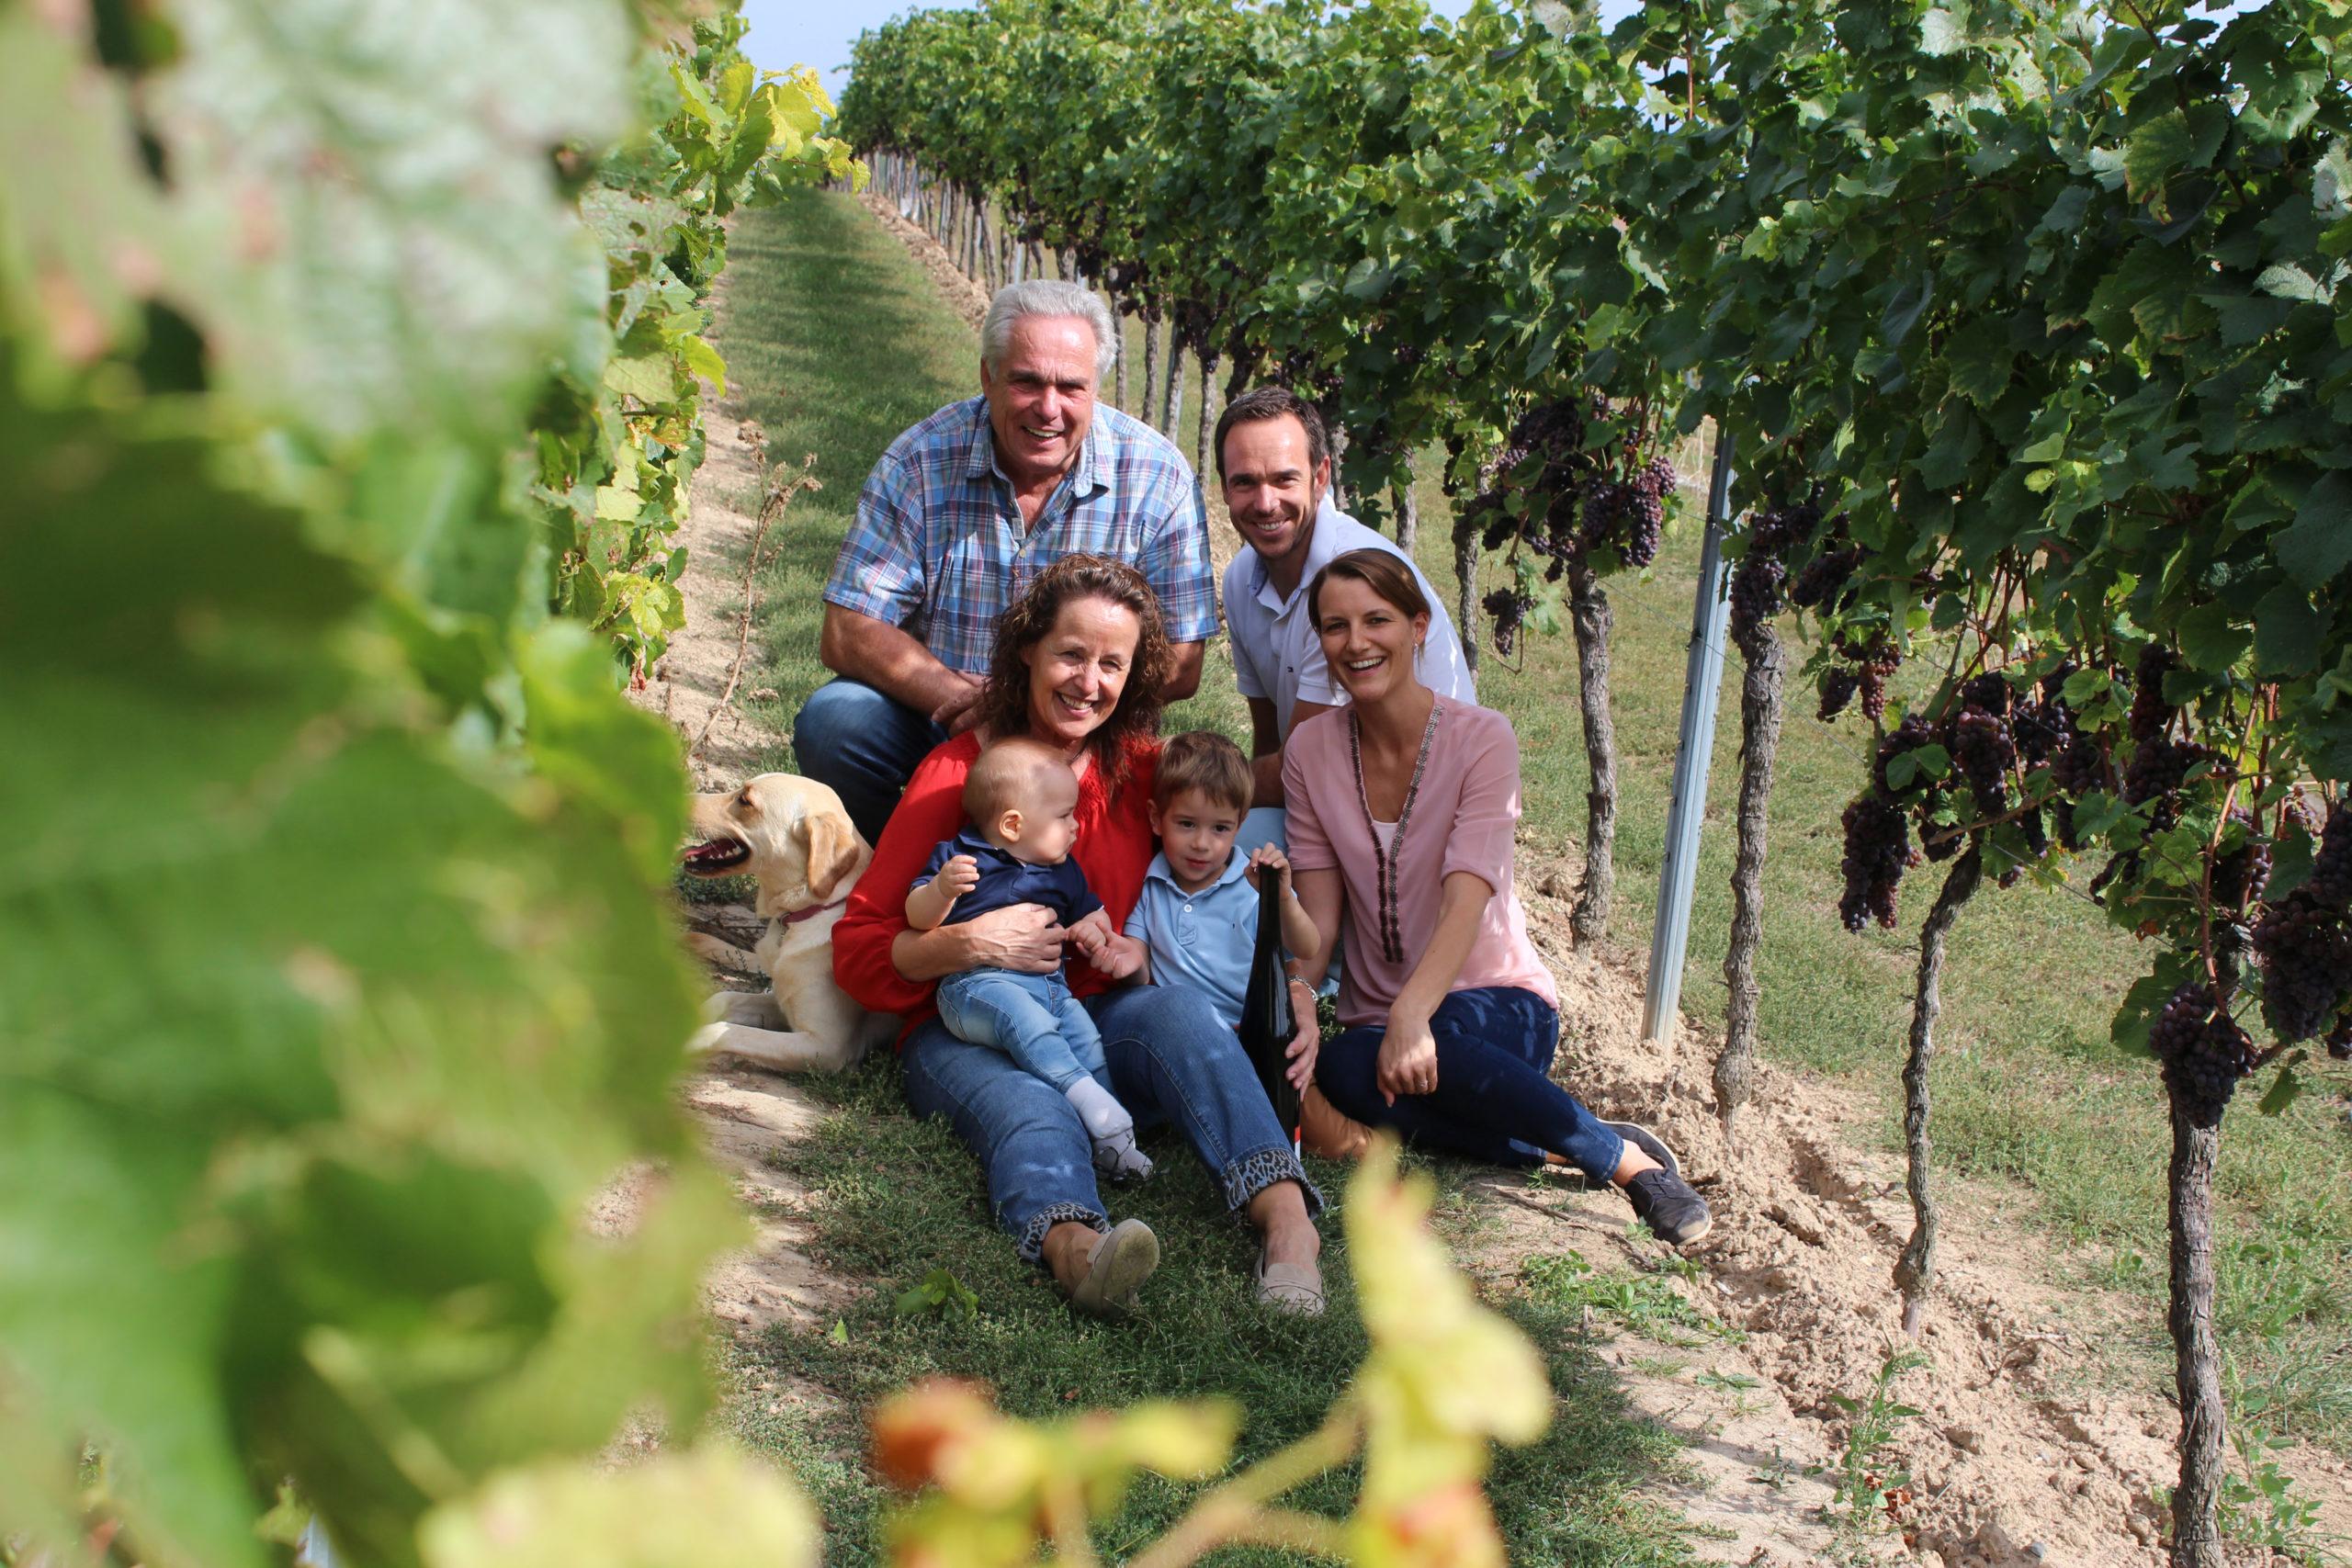 Weingut Stauff Ober-Flörsheim